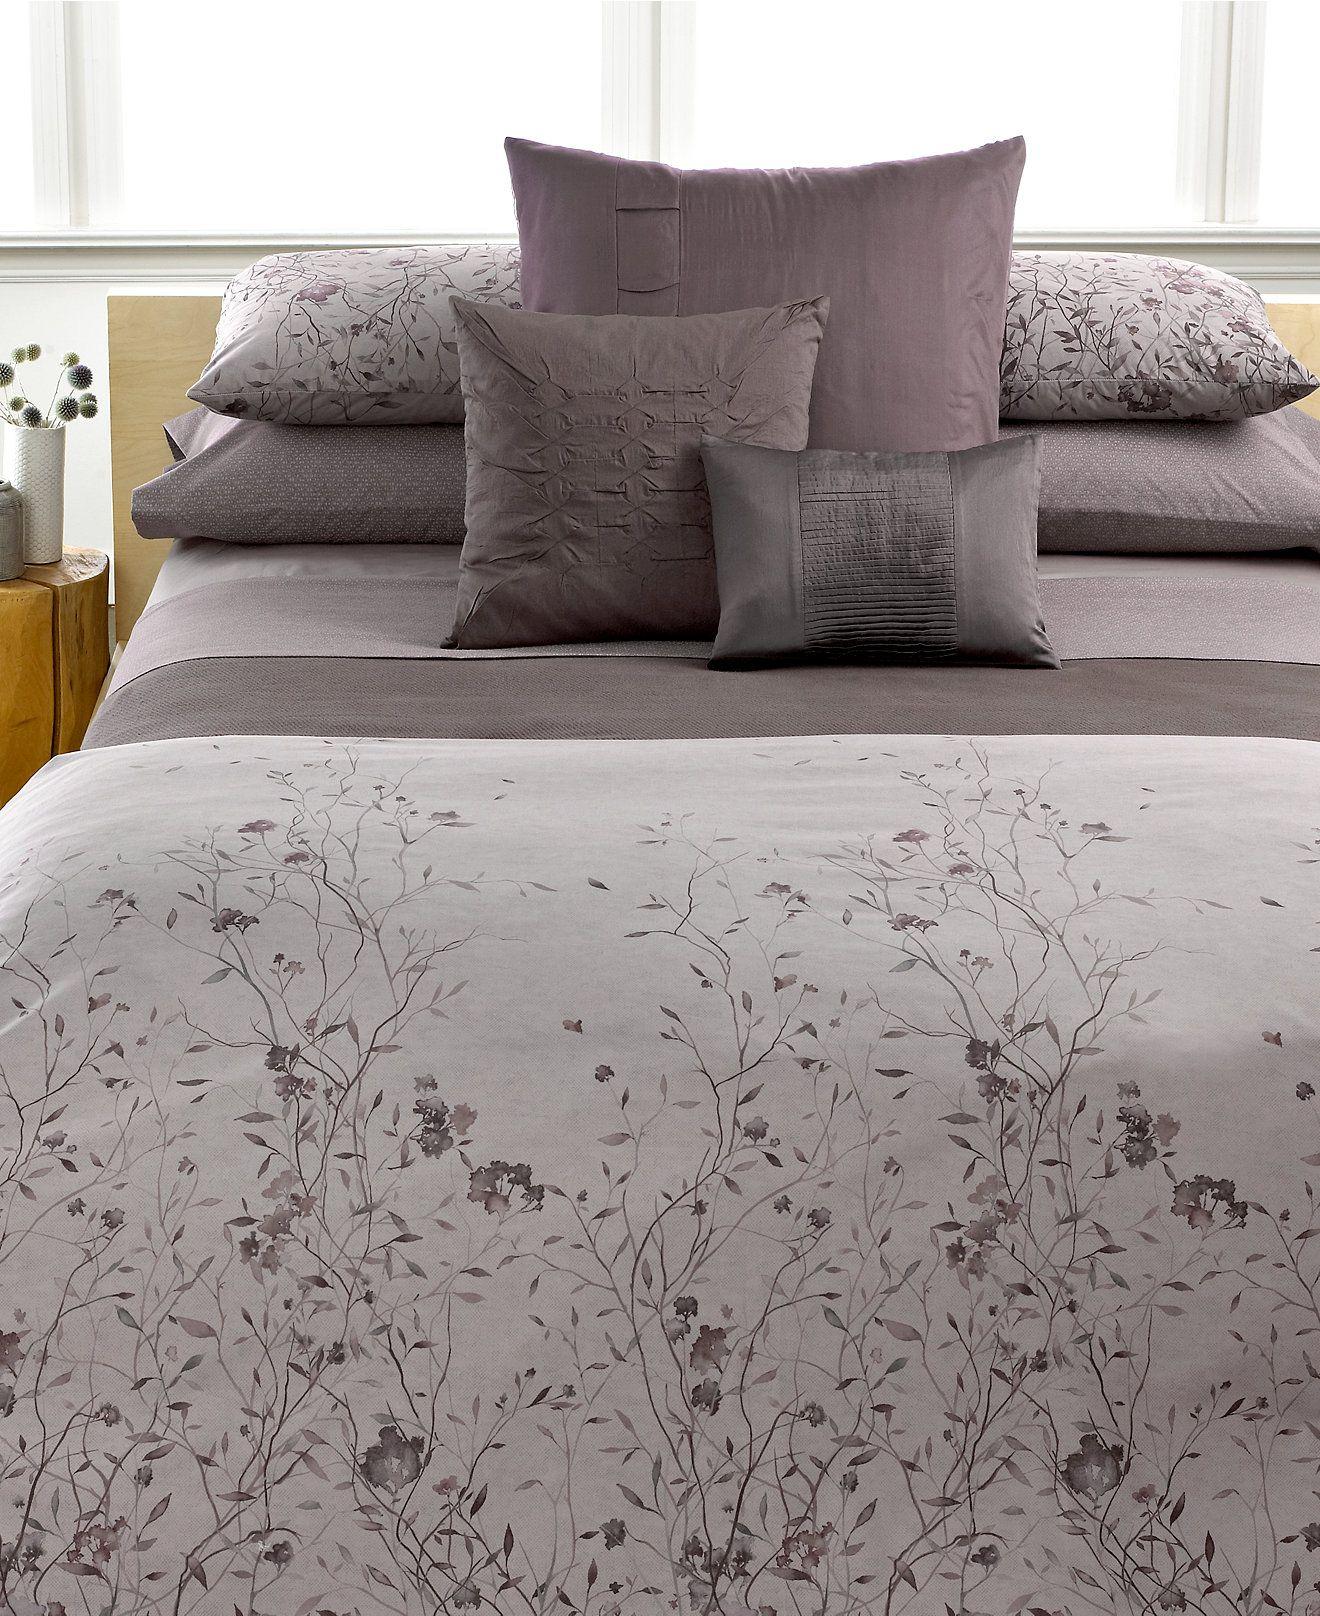 bedding klein quarry acacia calvin buy amara bed products cover duvet